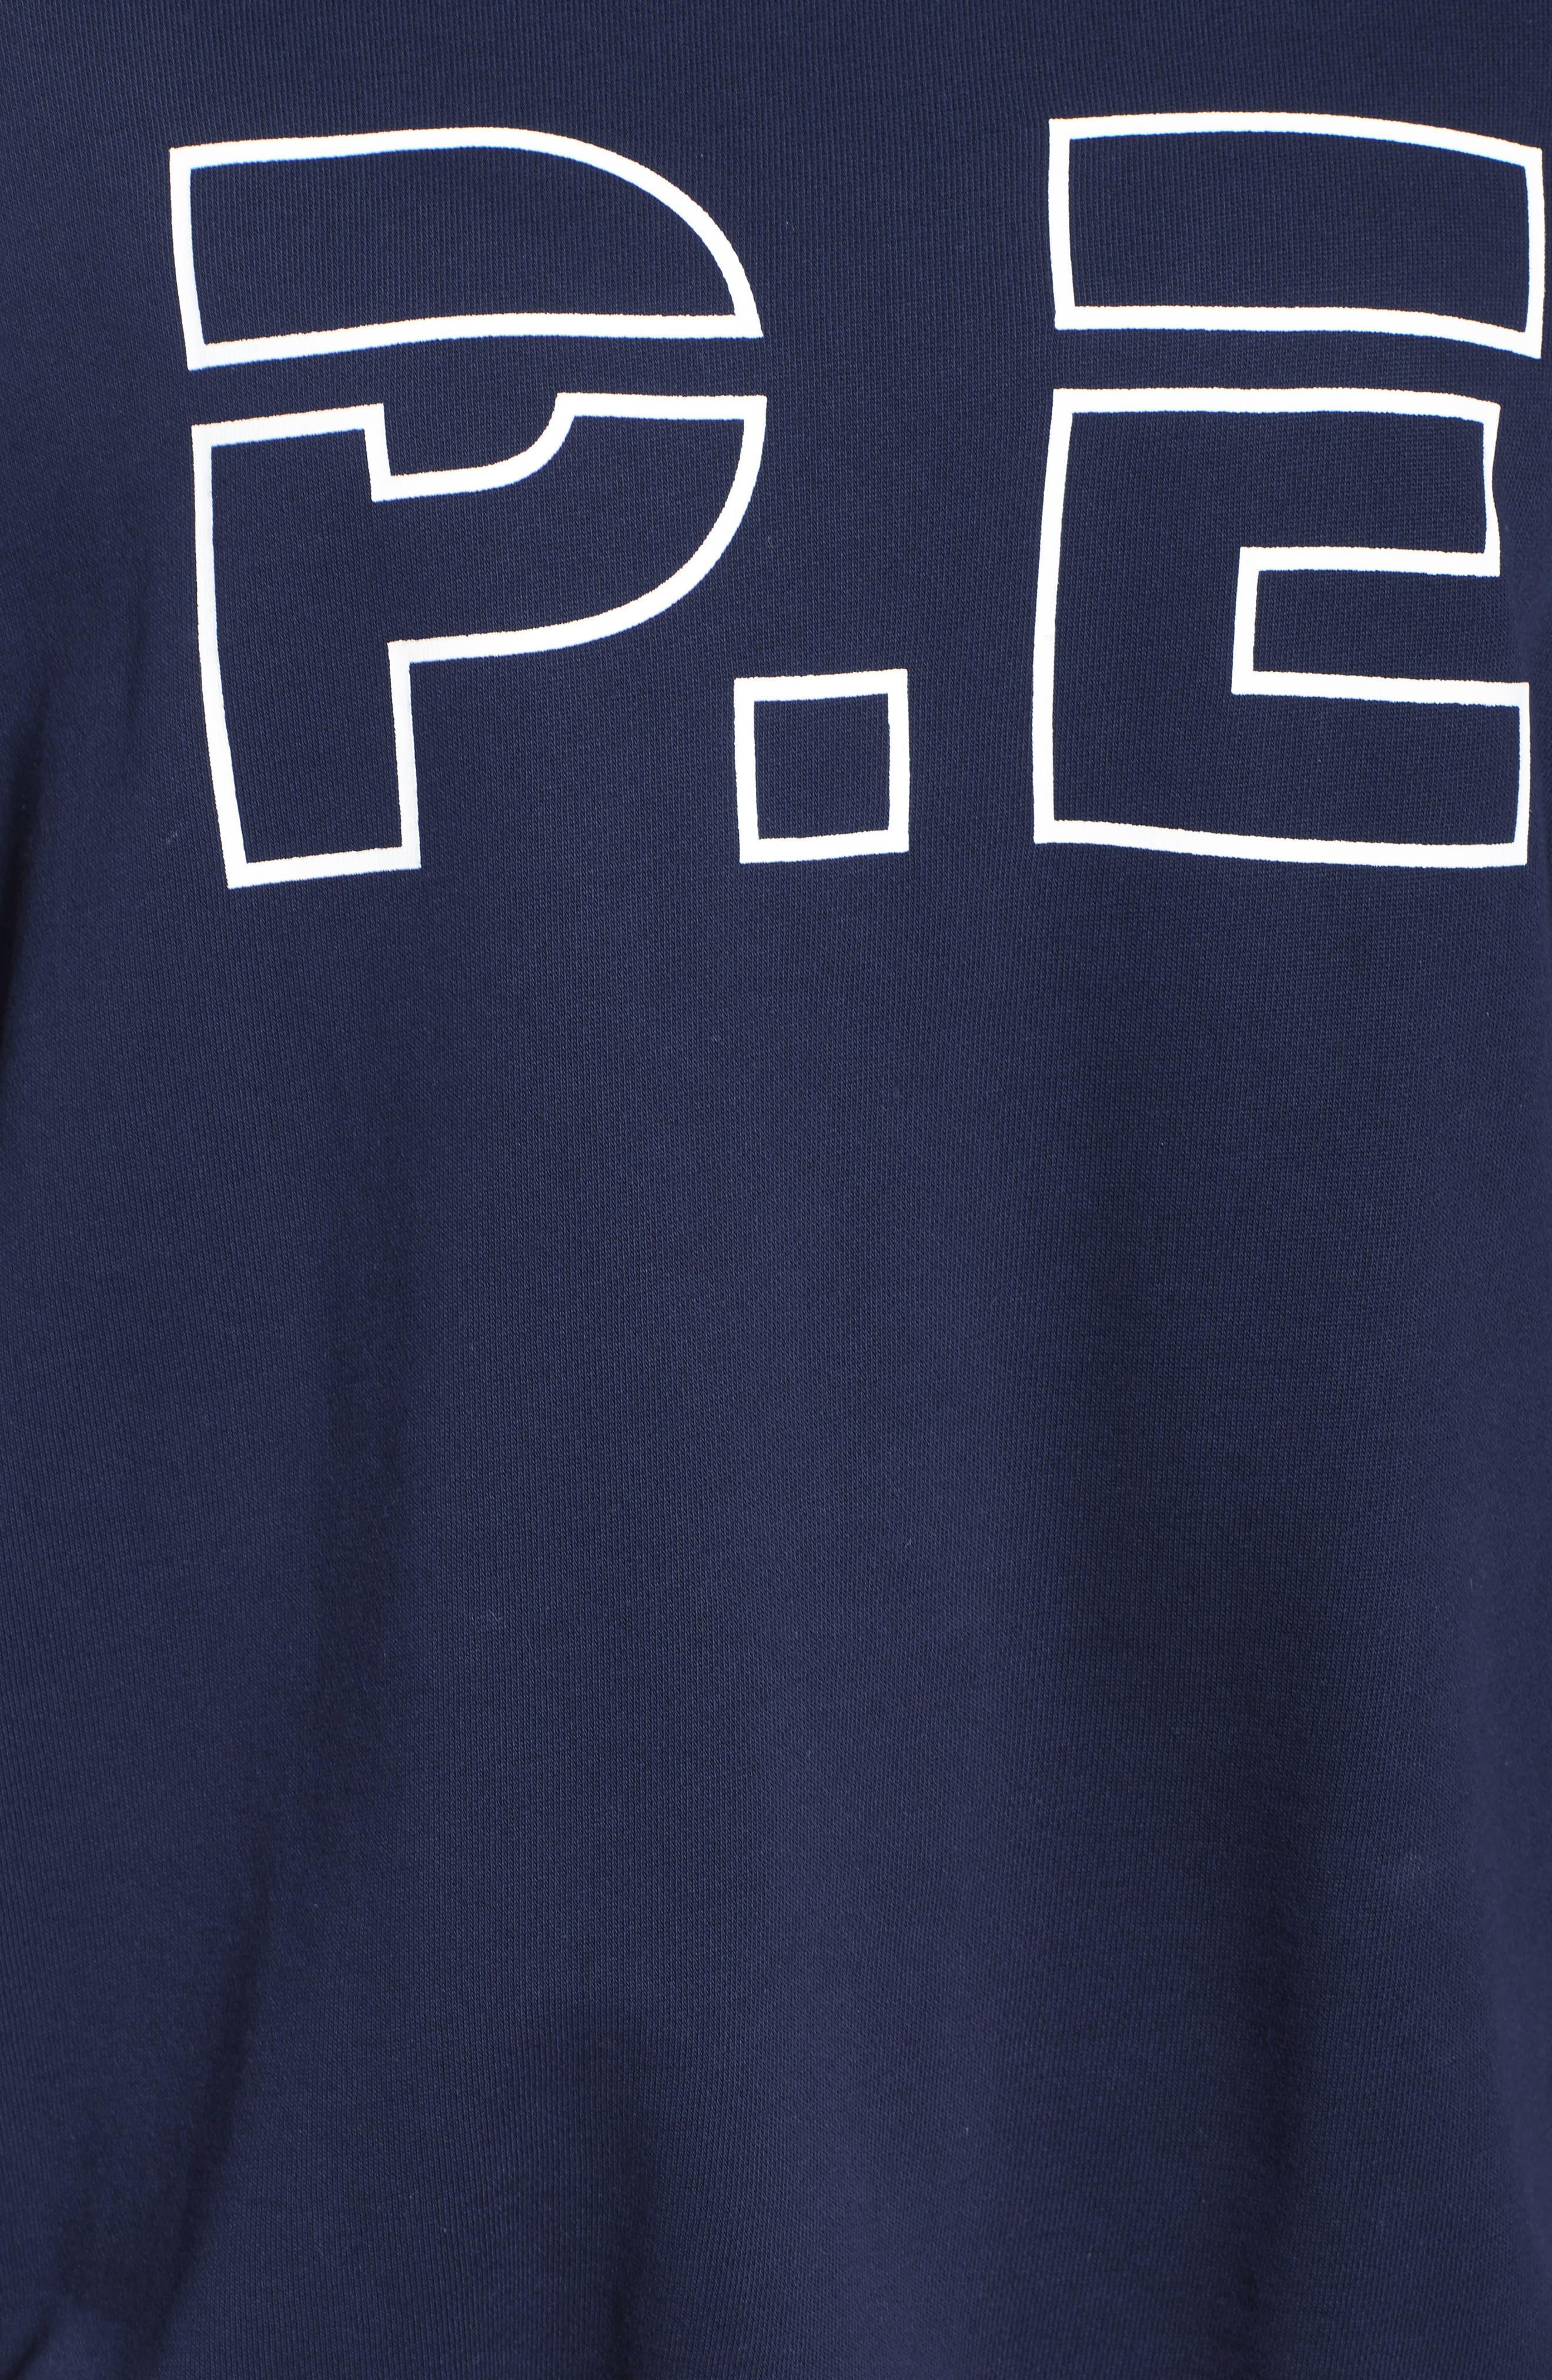 P.E. Nation The Heads Up Sweatshirt,                             Alternate thumbnail 5, color,                             Navy